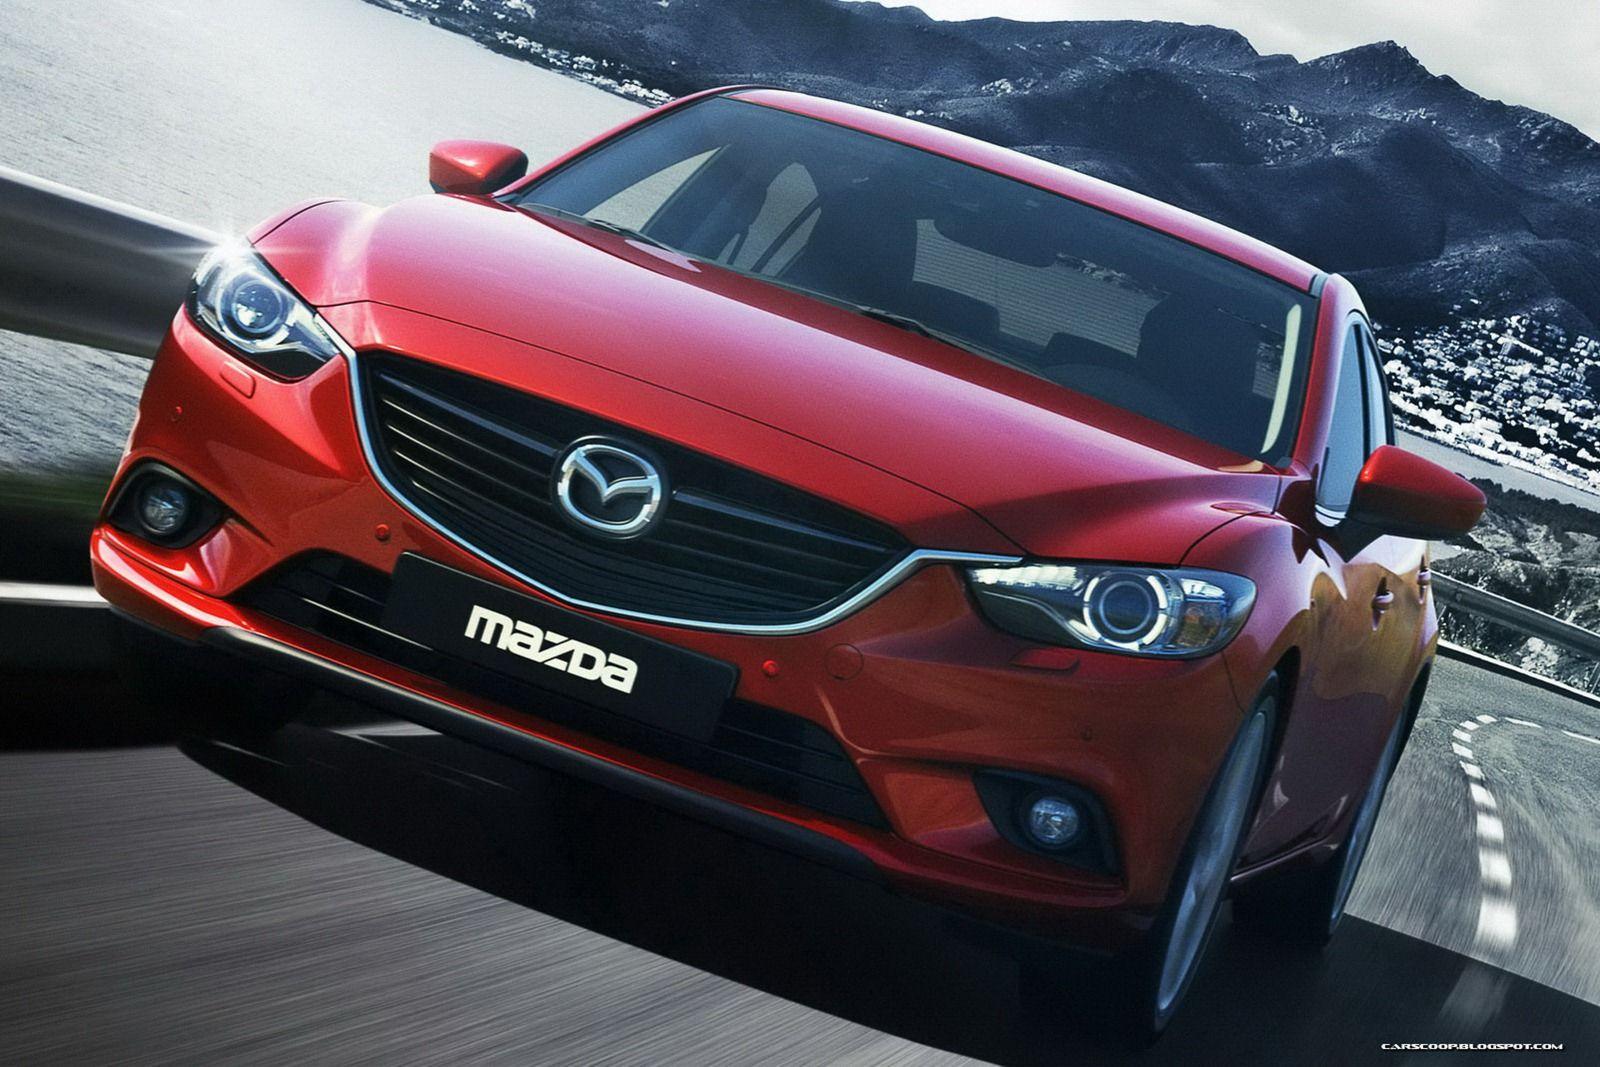 Mazda 6 2013 Wallpaper for iPad